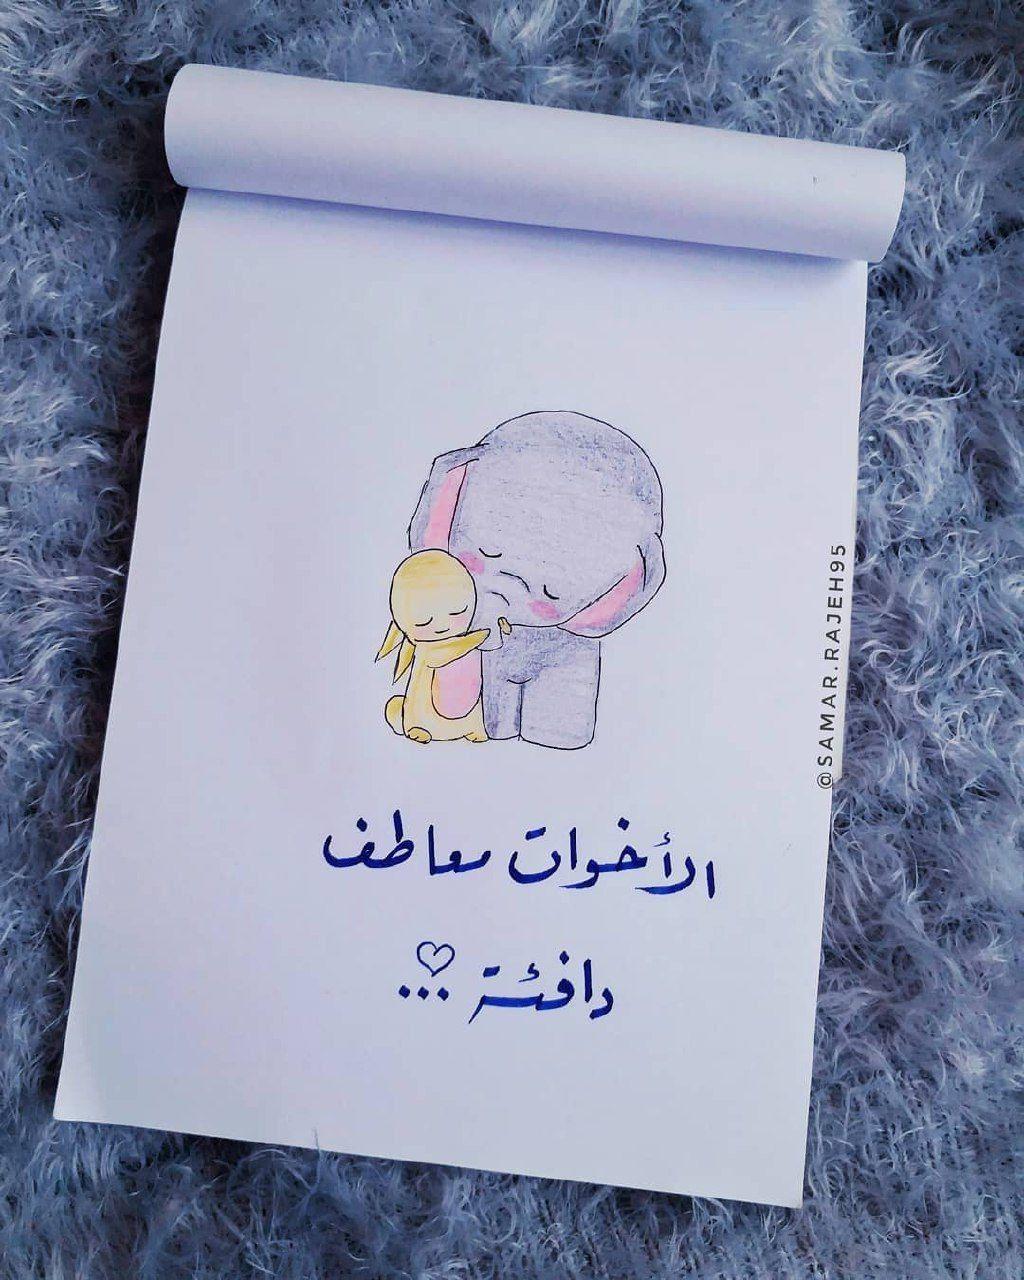 Pin By 향수 스프레이 On أخواني وأخواتي Arabic Art Anime Art Girl Words Quotes